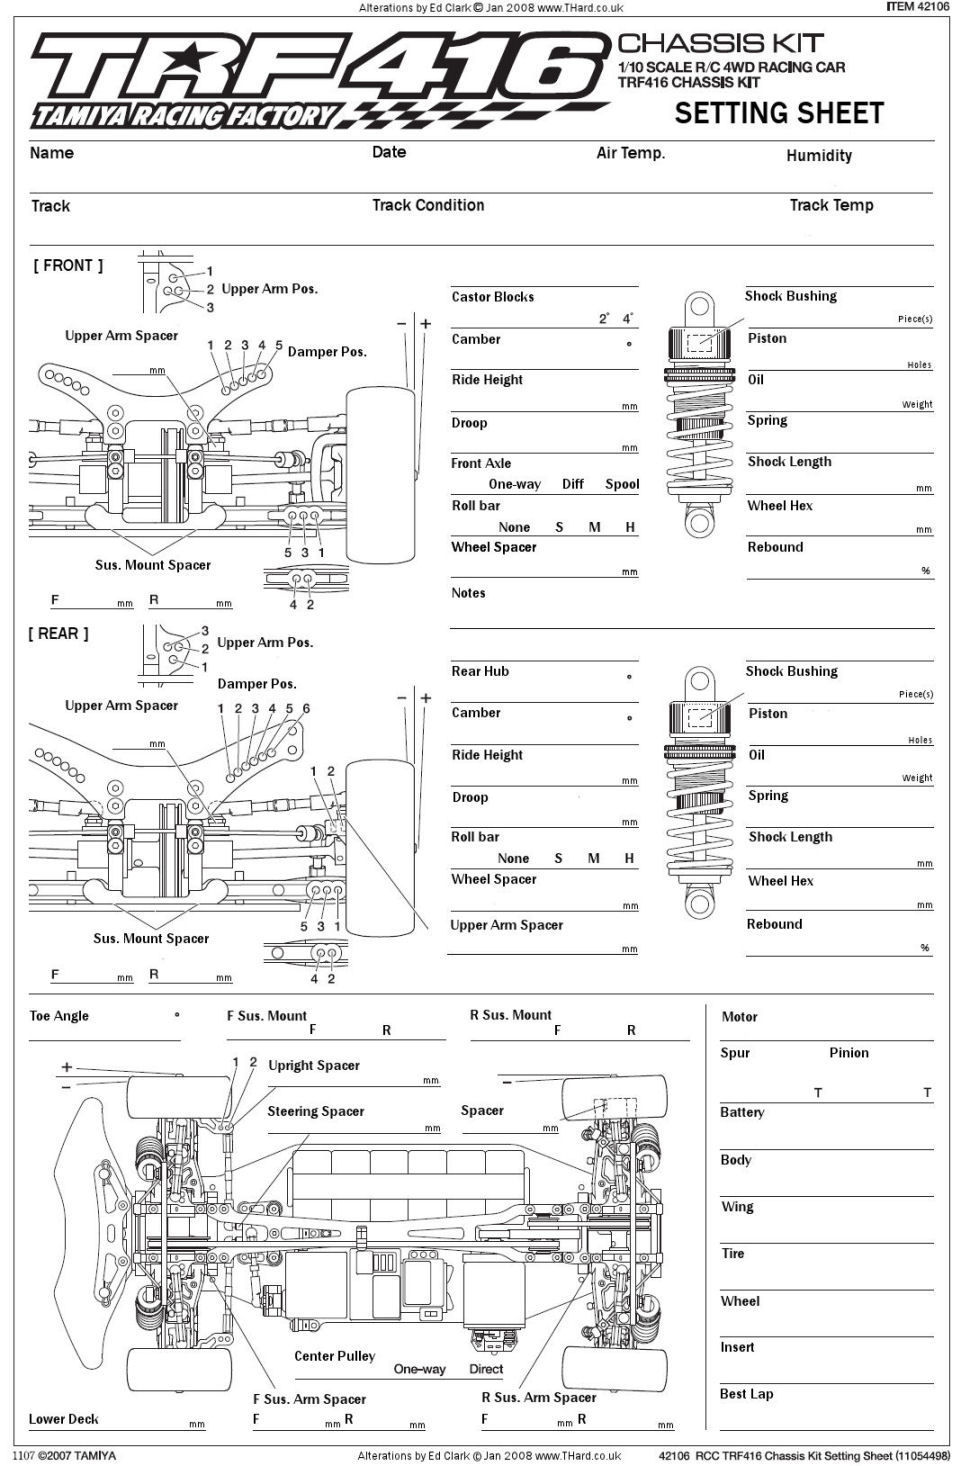 Setup Sheet Data Base PETITRC - oukas info